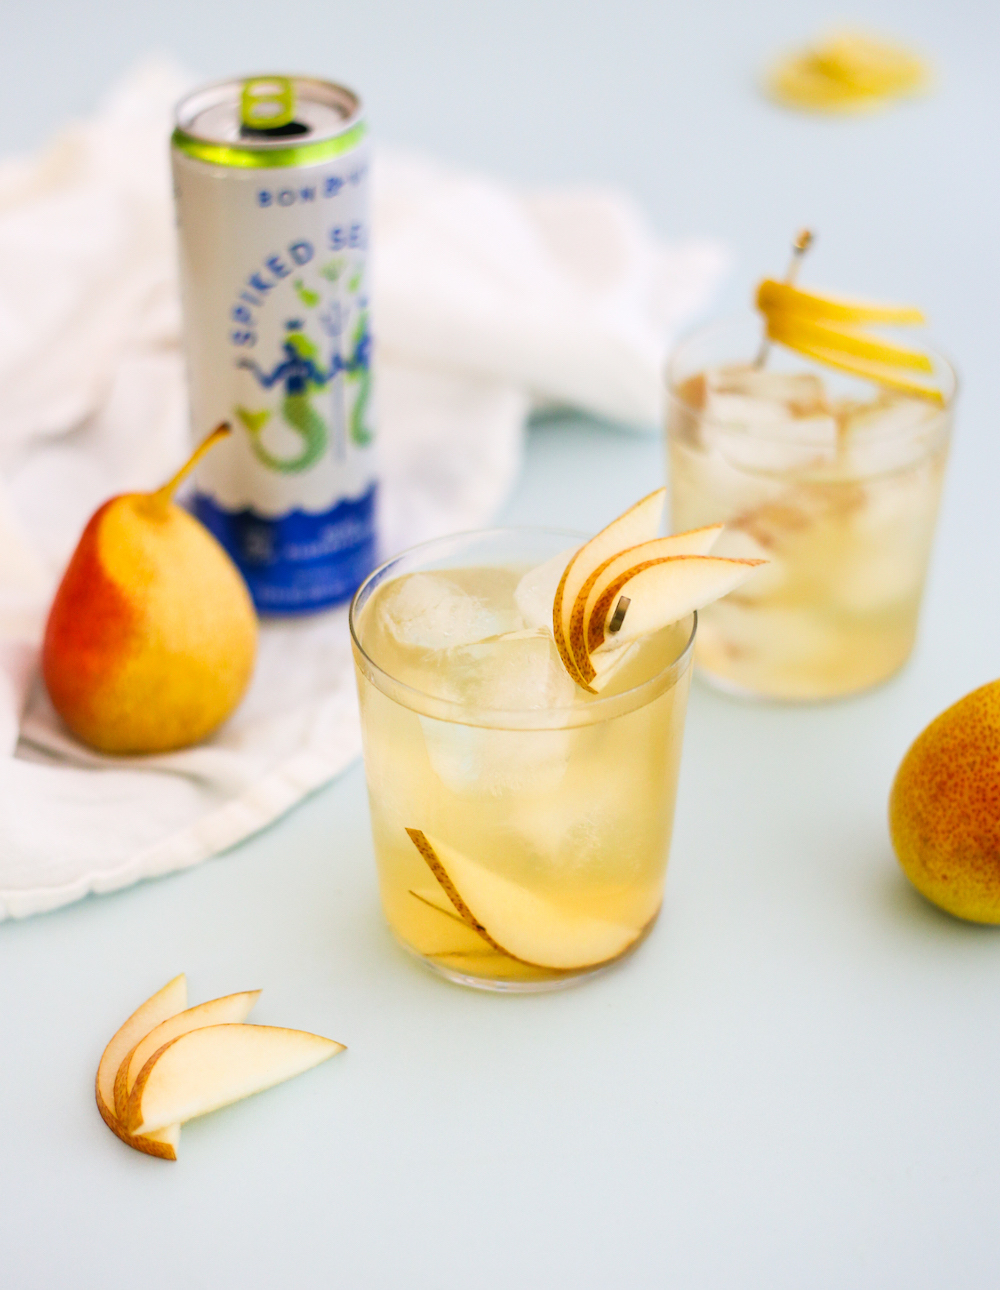 Spiked Seltzer Cocktail: Pear Elderflower Seltzer with Bourbon and Honey